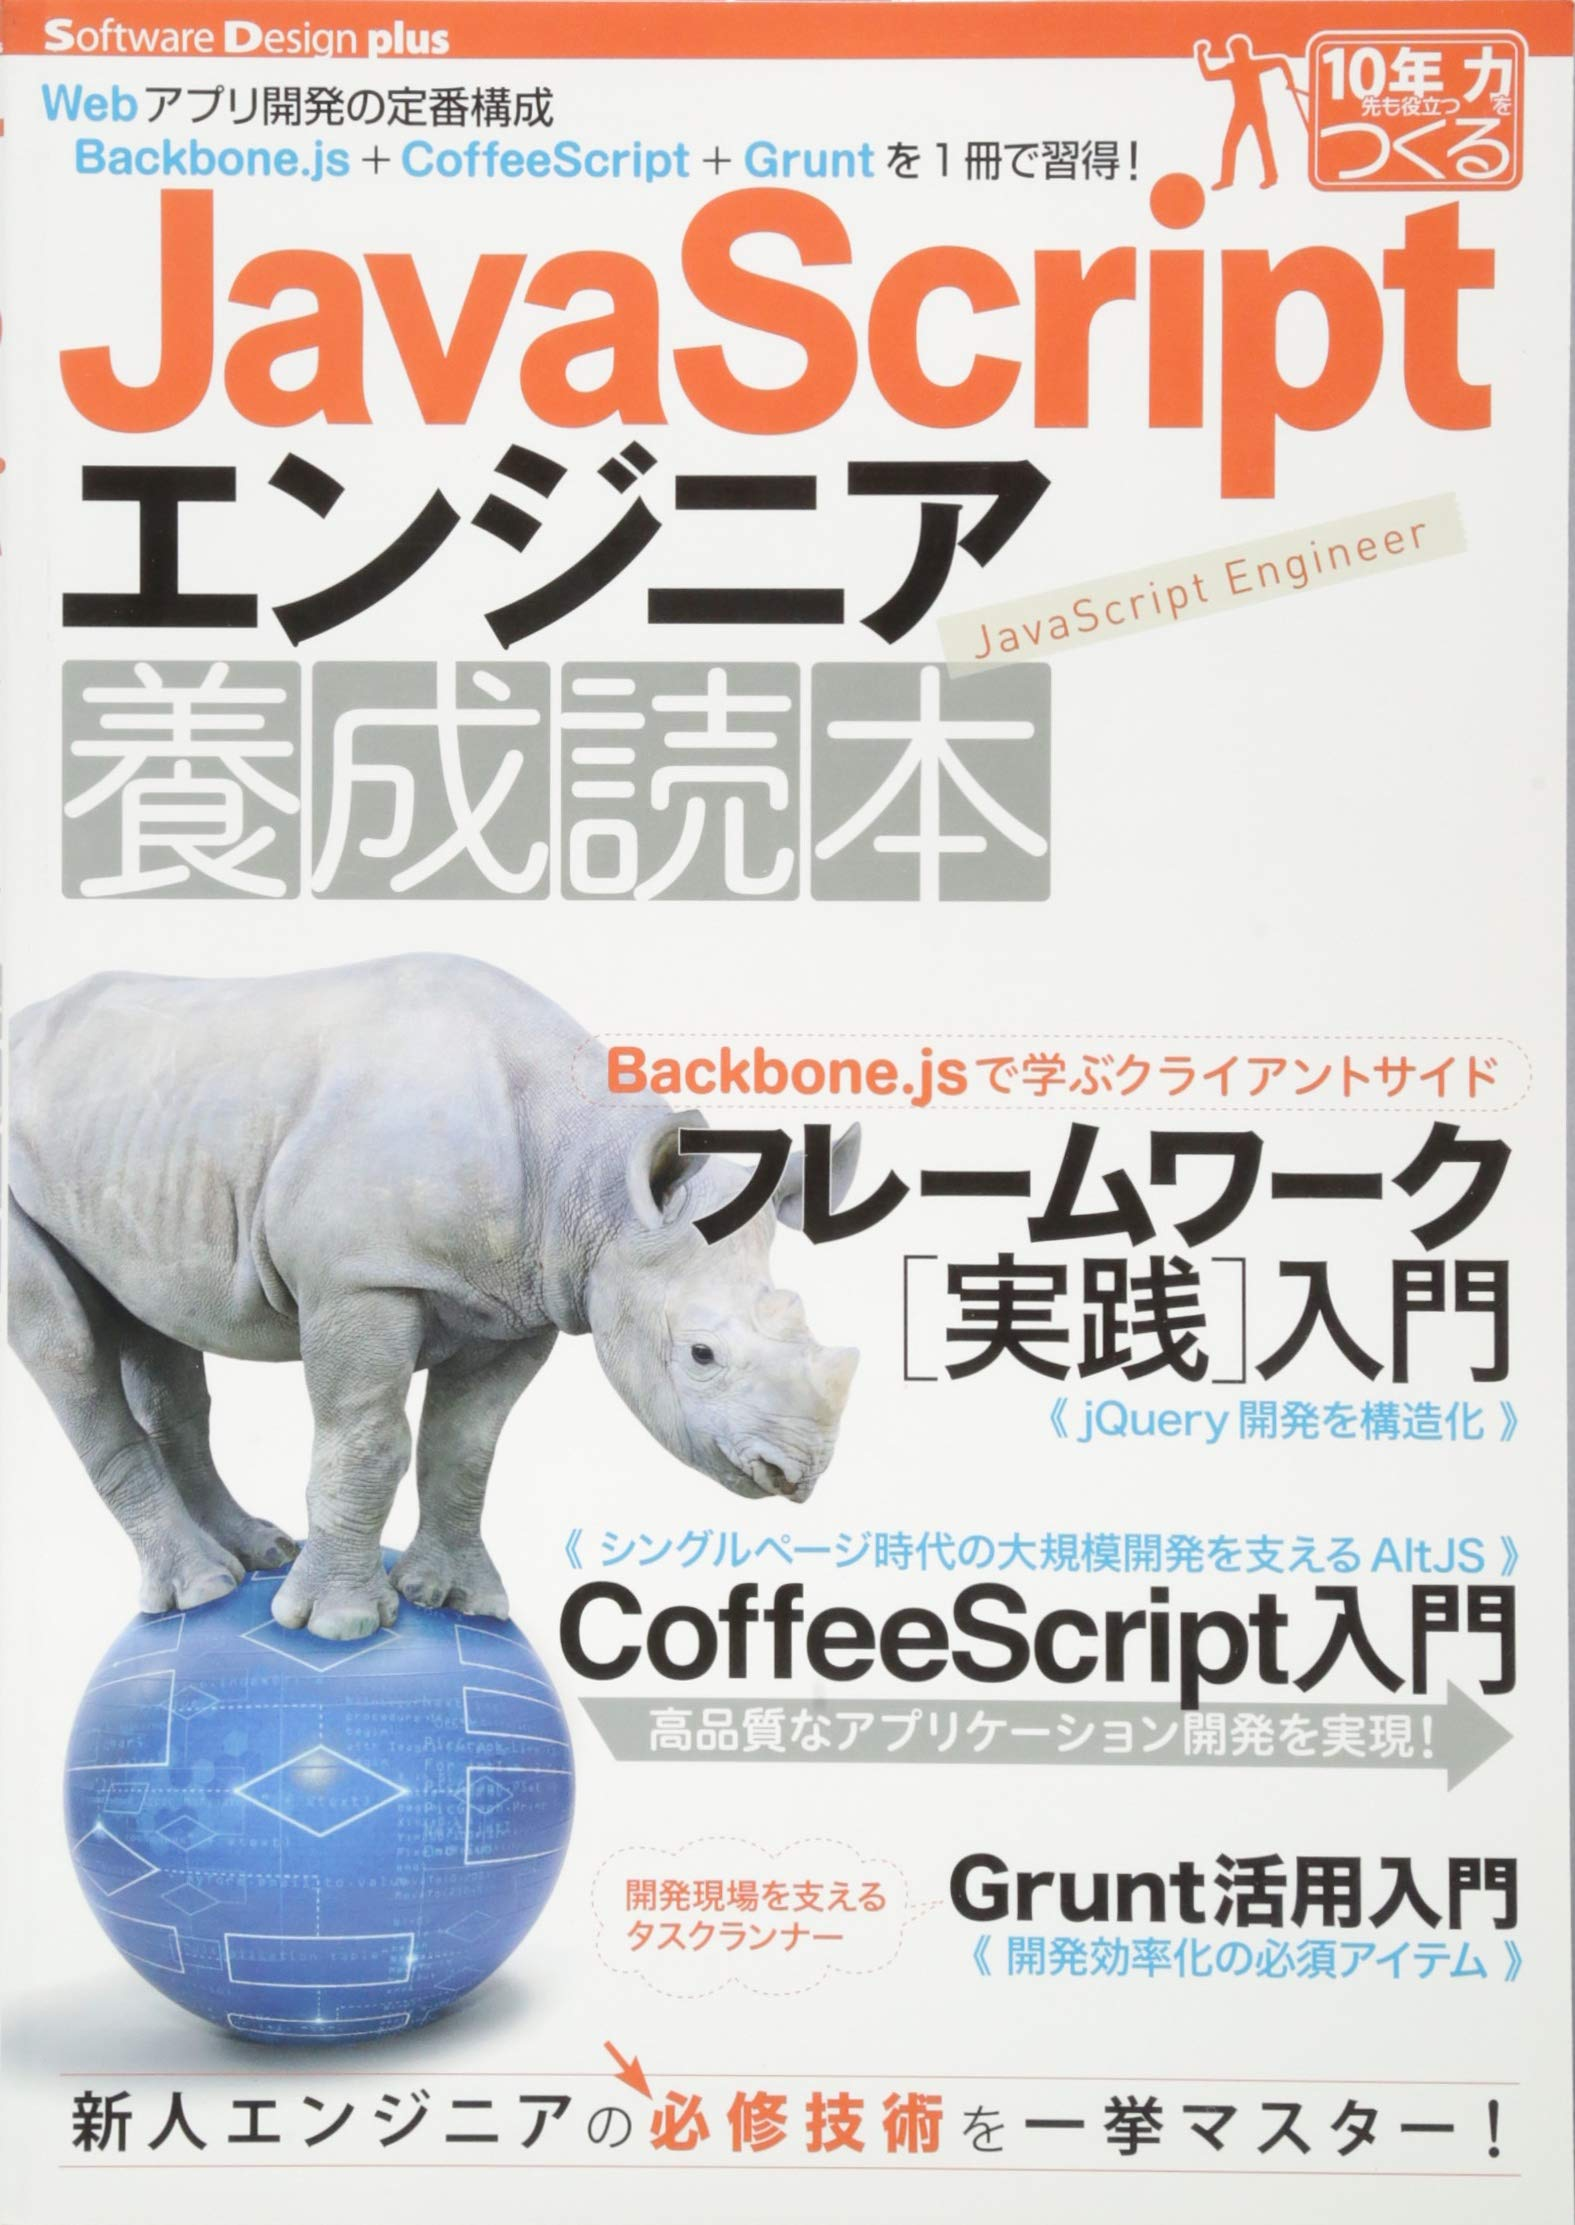 Image of JavaScriptエンジニア養成読本0